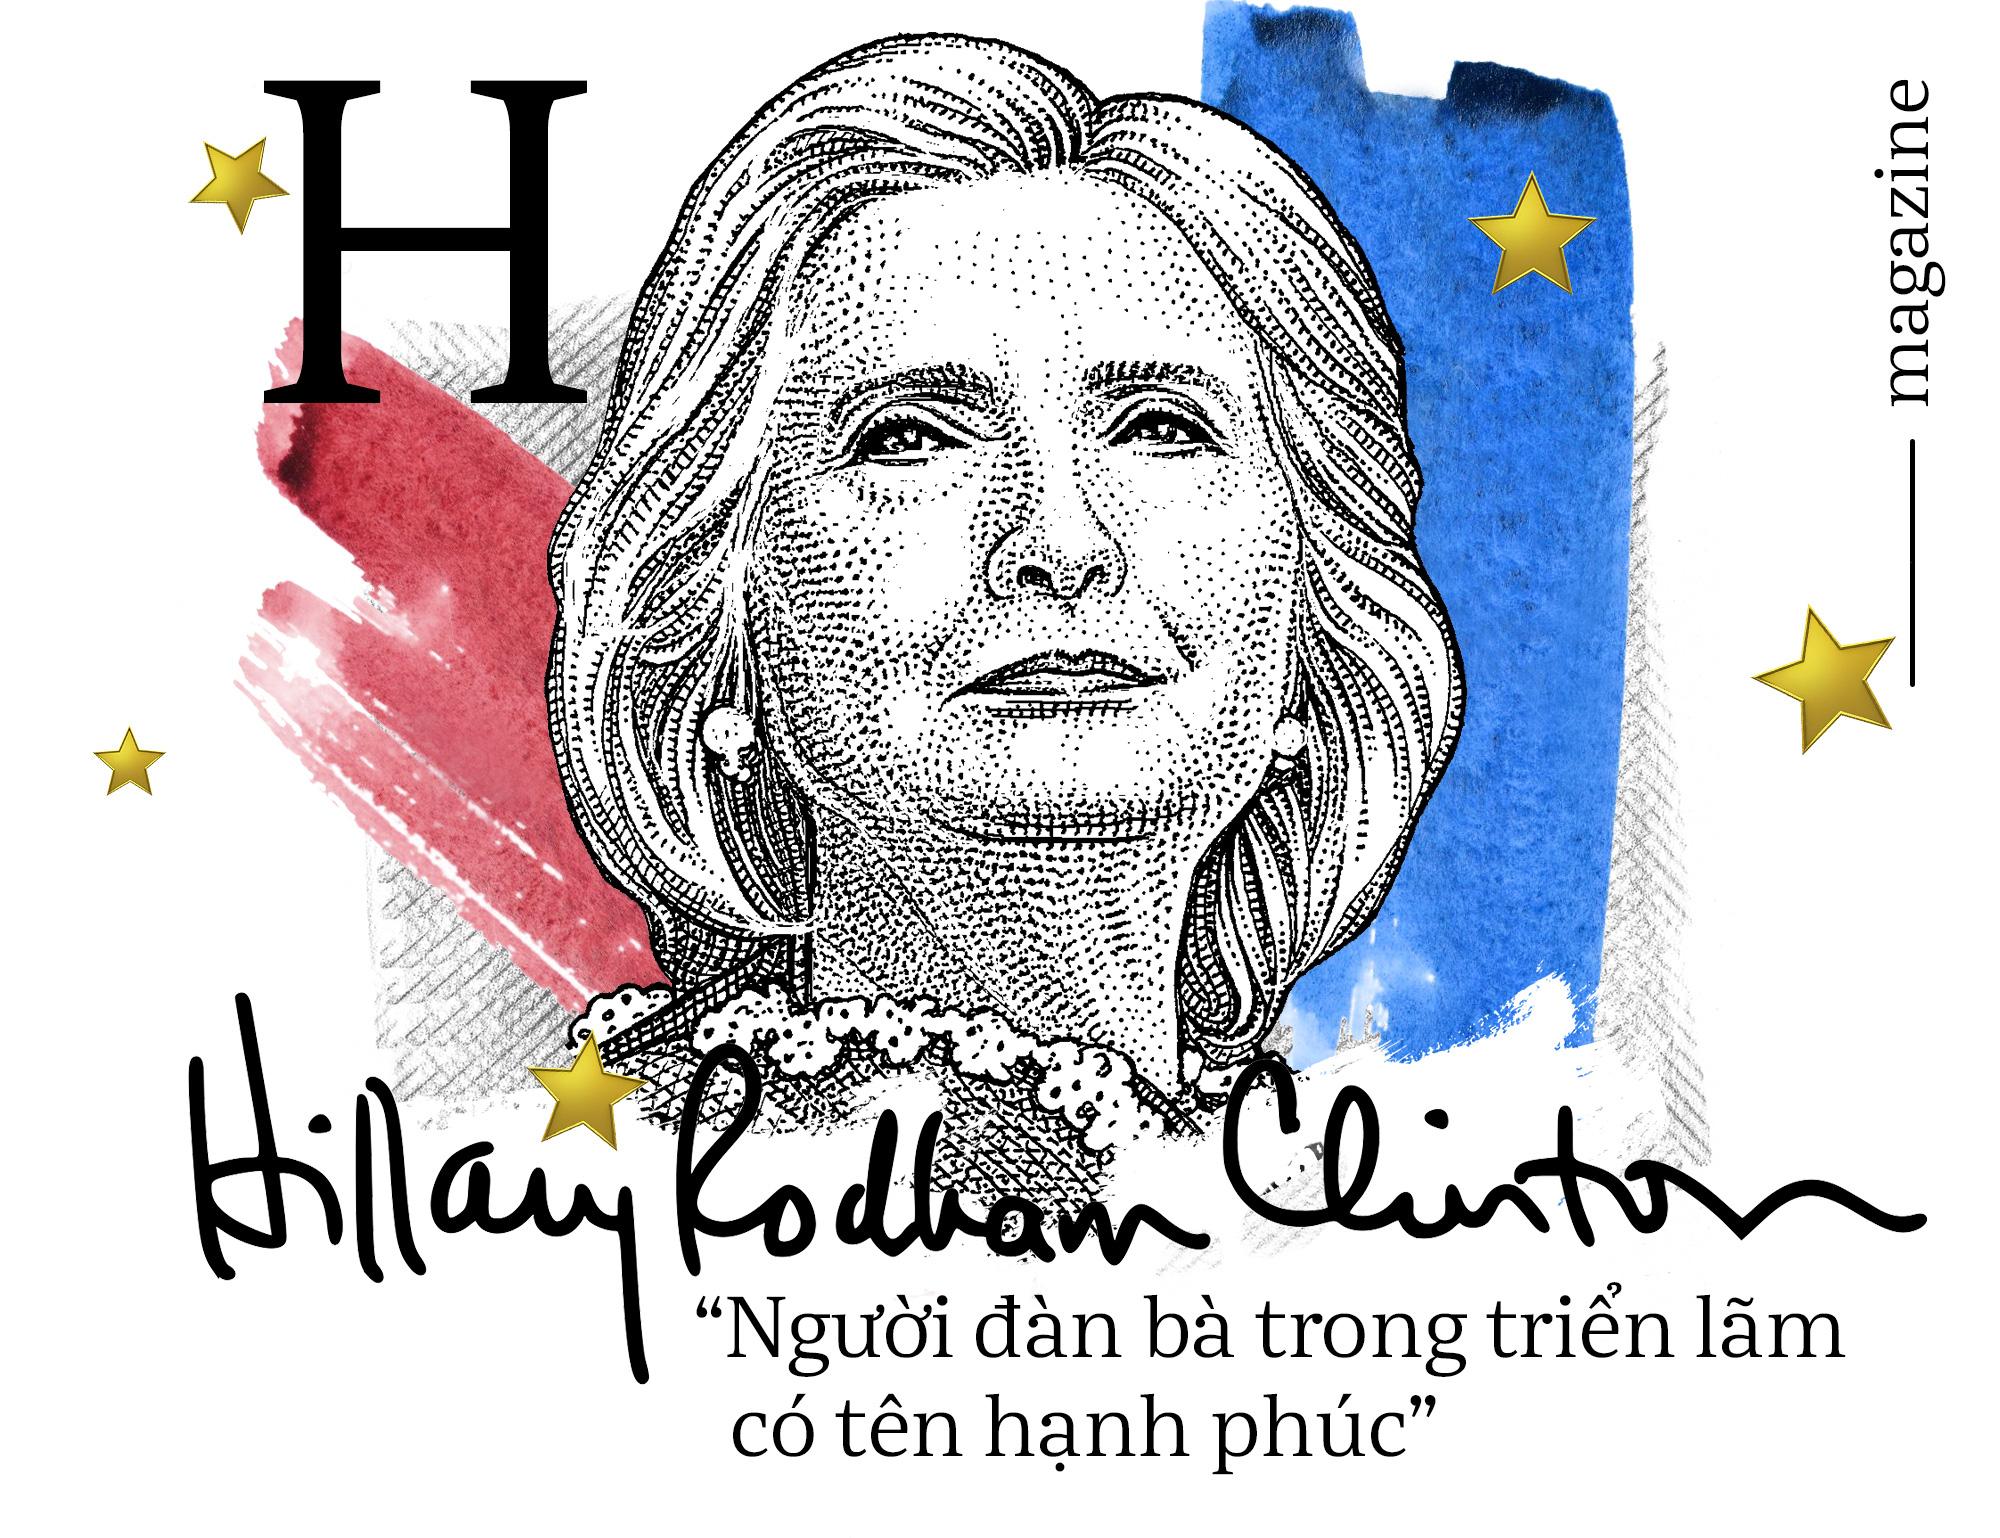 Hillary Rodham Clinton . nguoidentubinhduong.com